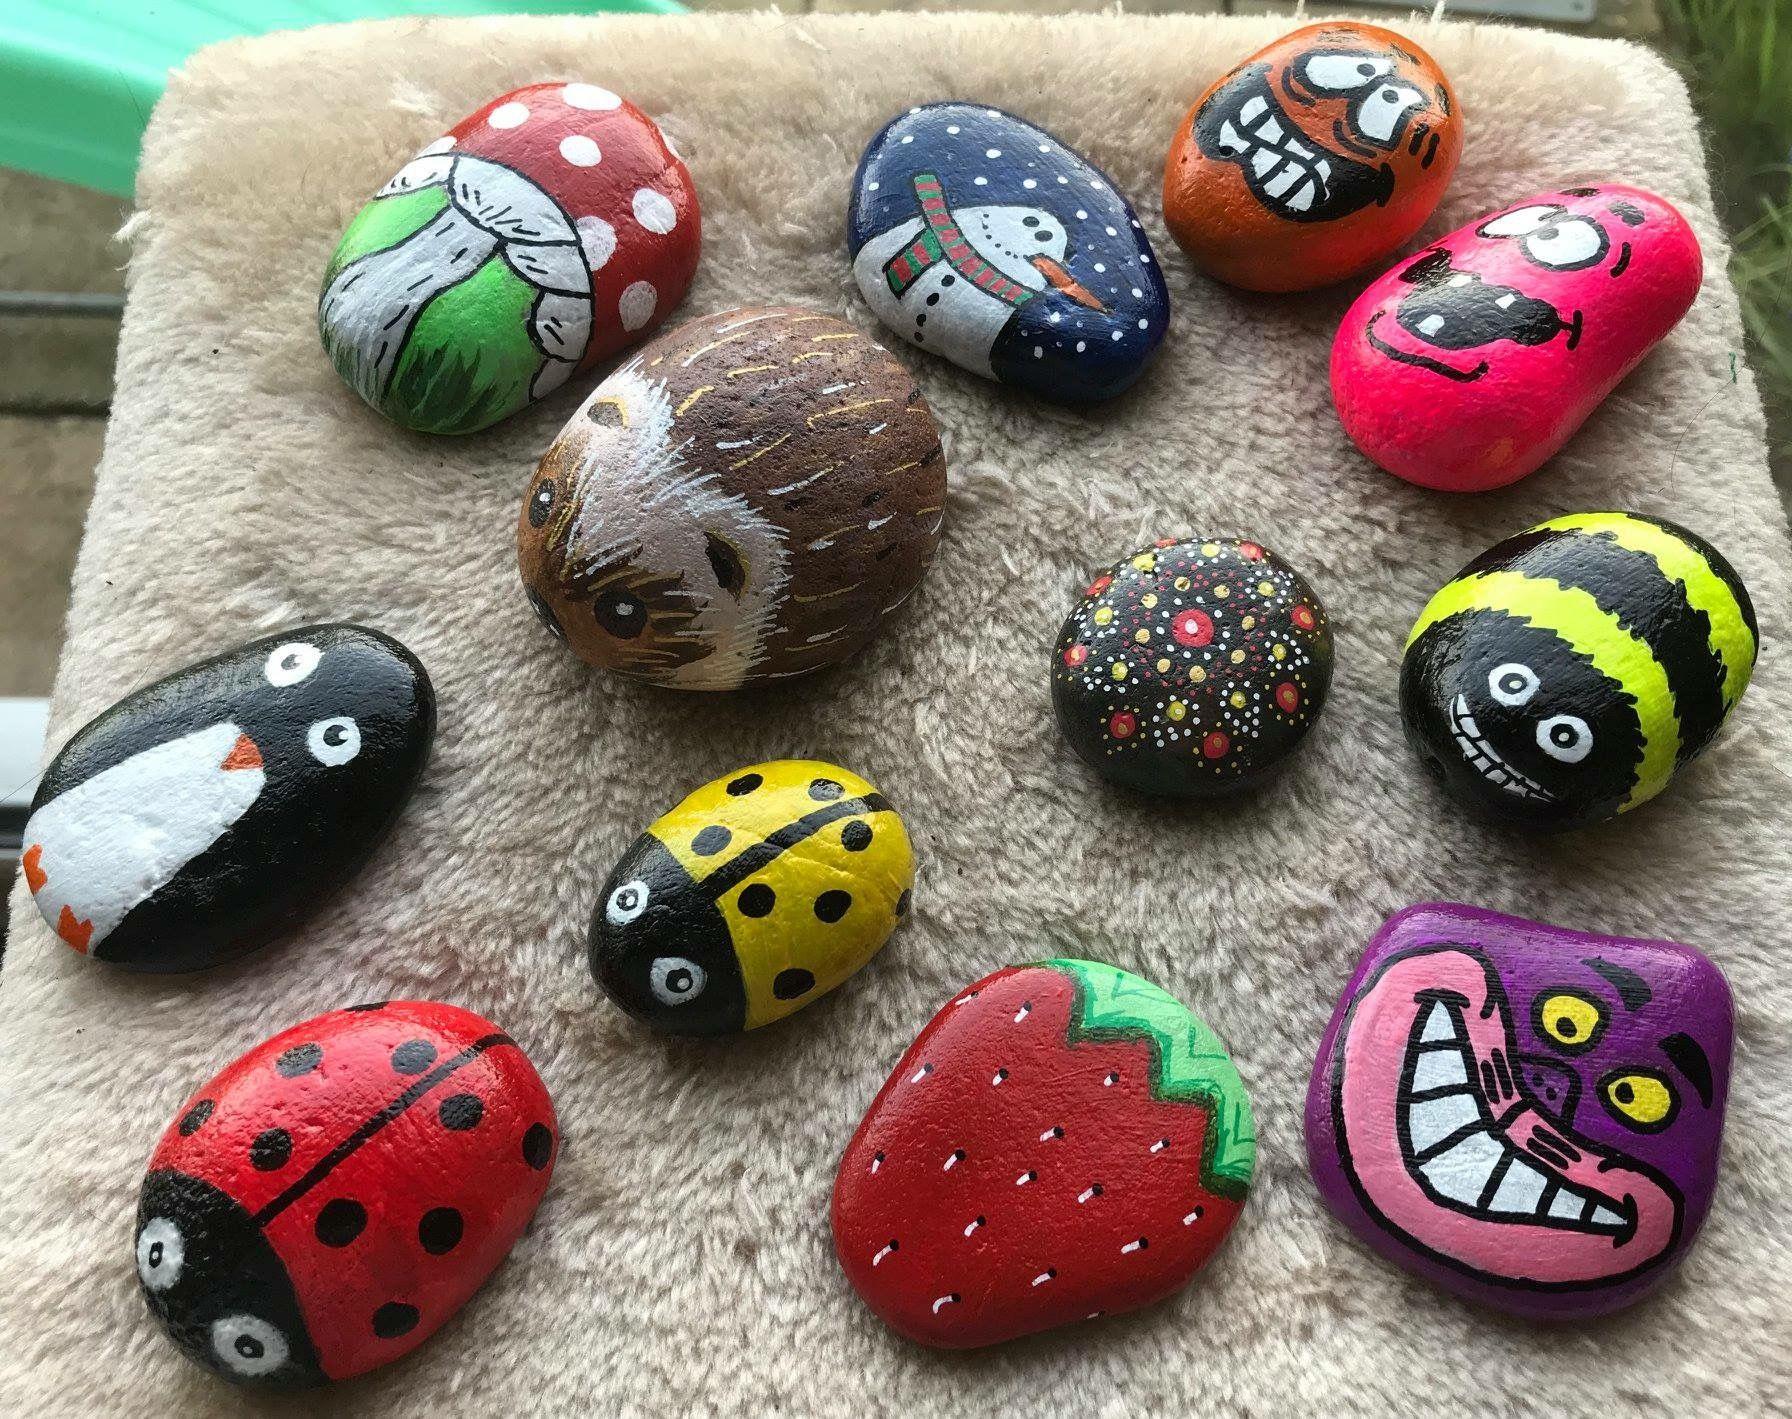 Painted Rocks Hedgehog Ladybugs Strawberry Cheshire Cat Funny Faces Snowman Penguin Mushroom Be Painted Rocks Painted Rocks Kids Rock Painting Patterns